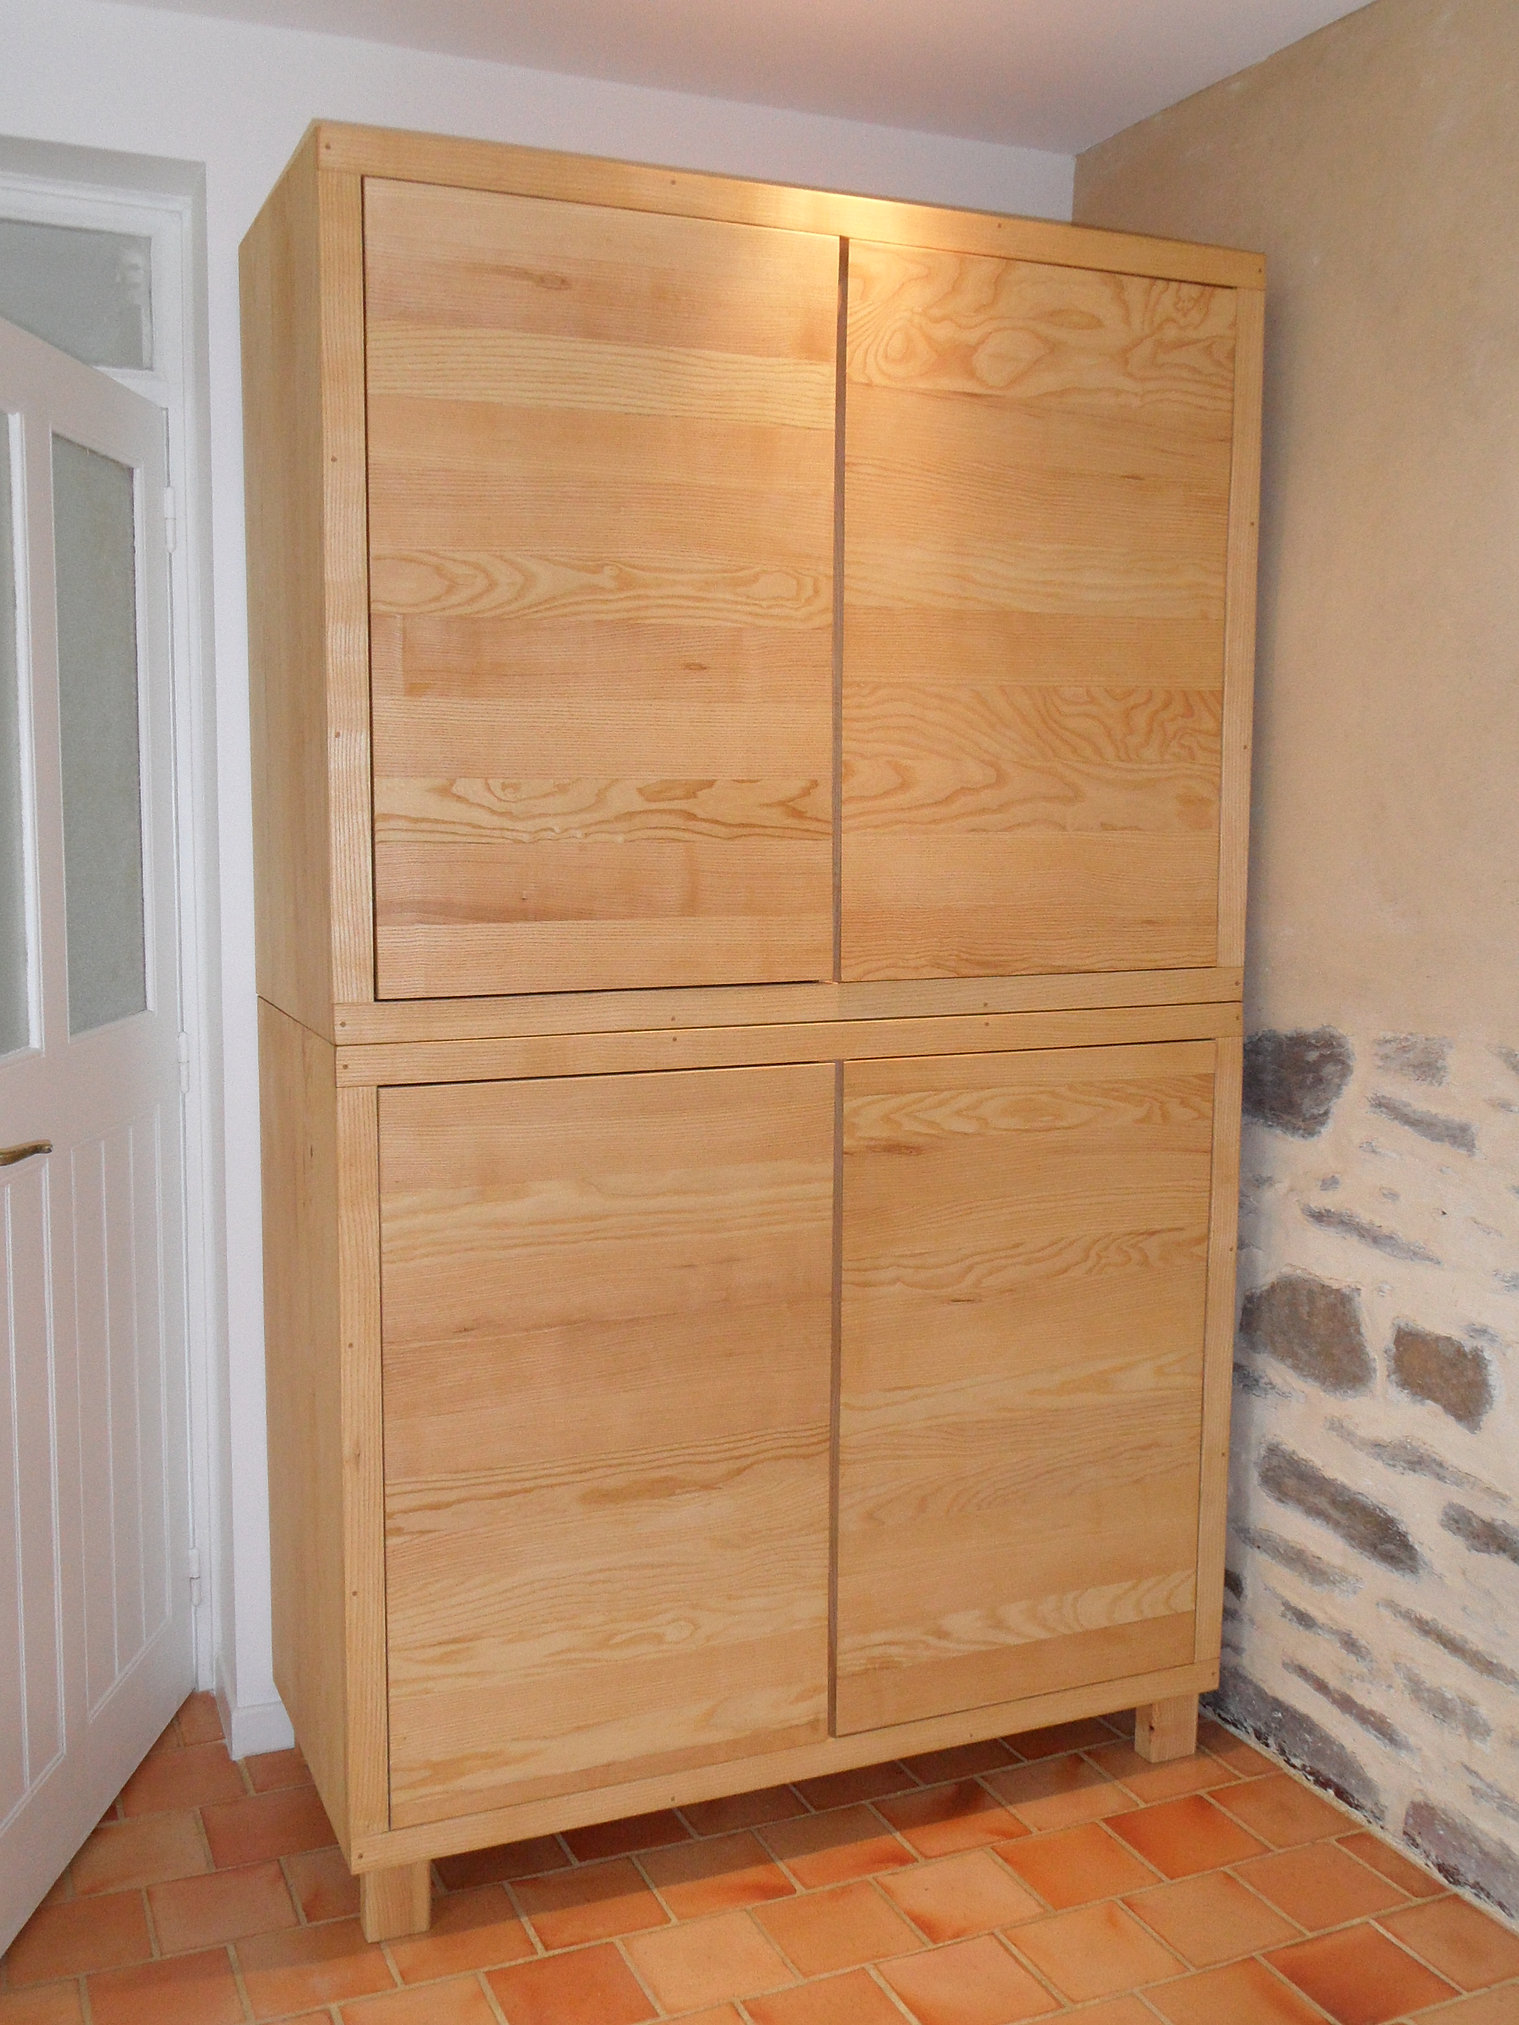 armoire chambre bois massif chambre avec salle de bain 38 chambre avec salle de bain 38. Black Bedroom Furniture Sets. Home Design Ideas